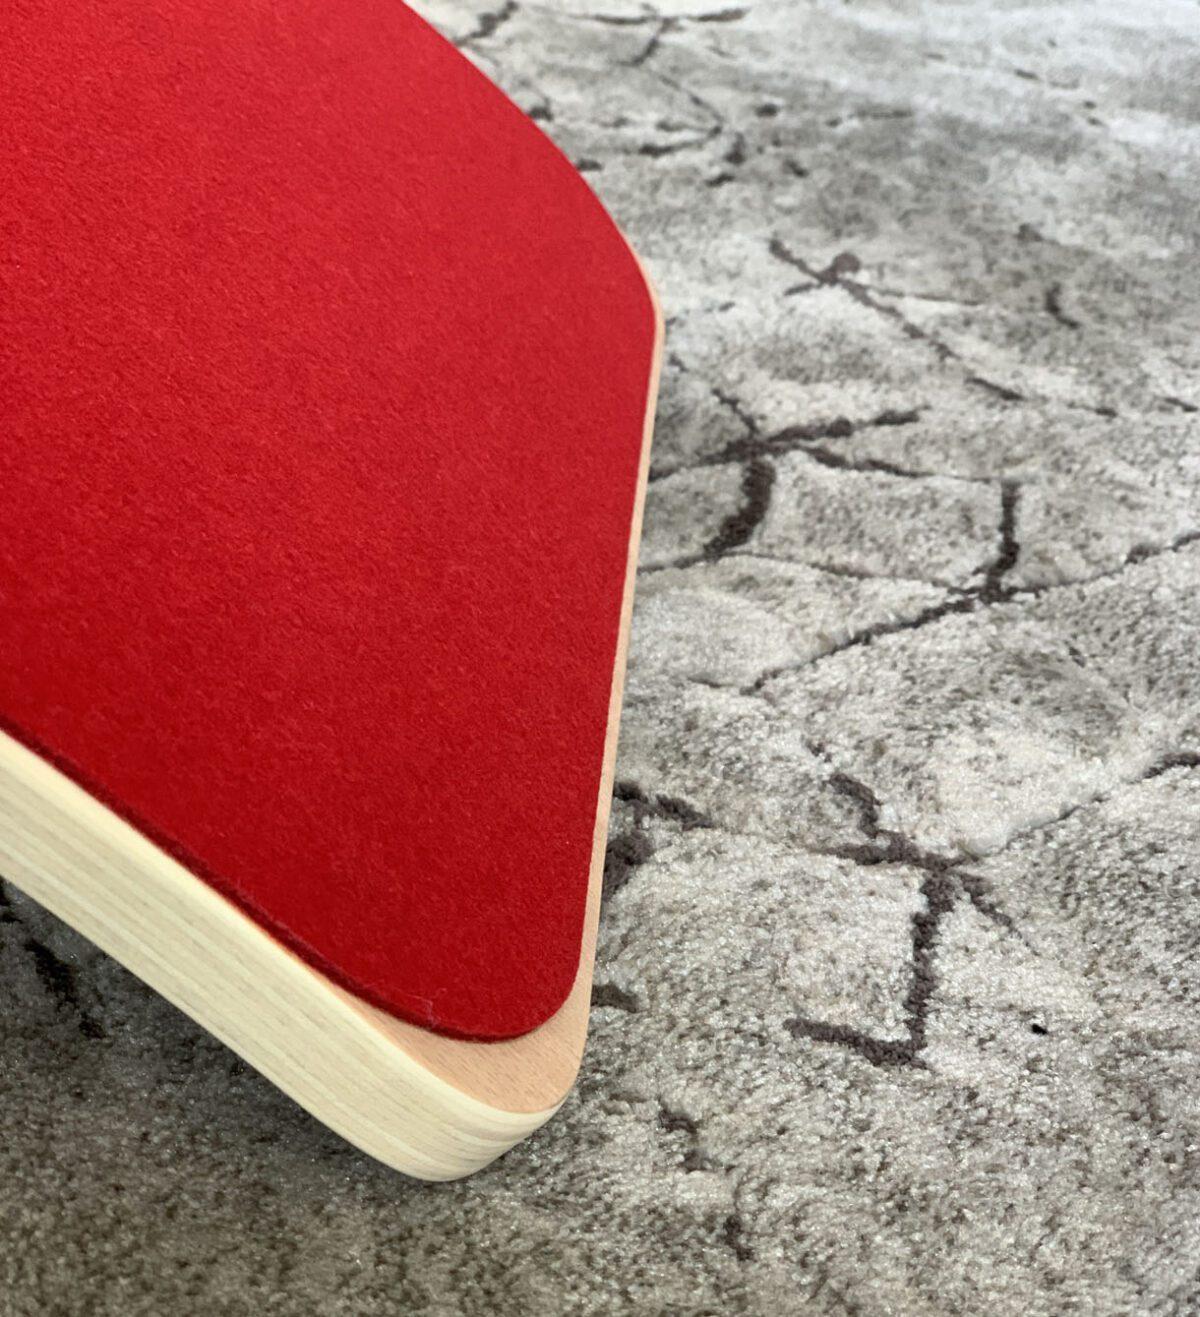 Houten balance board met vilt rood jindl